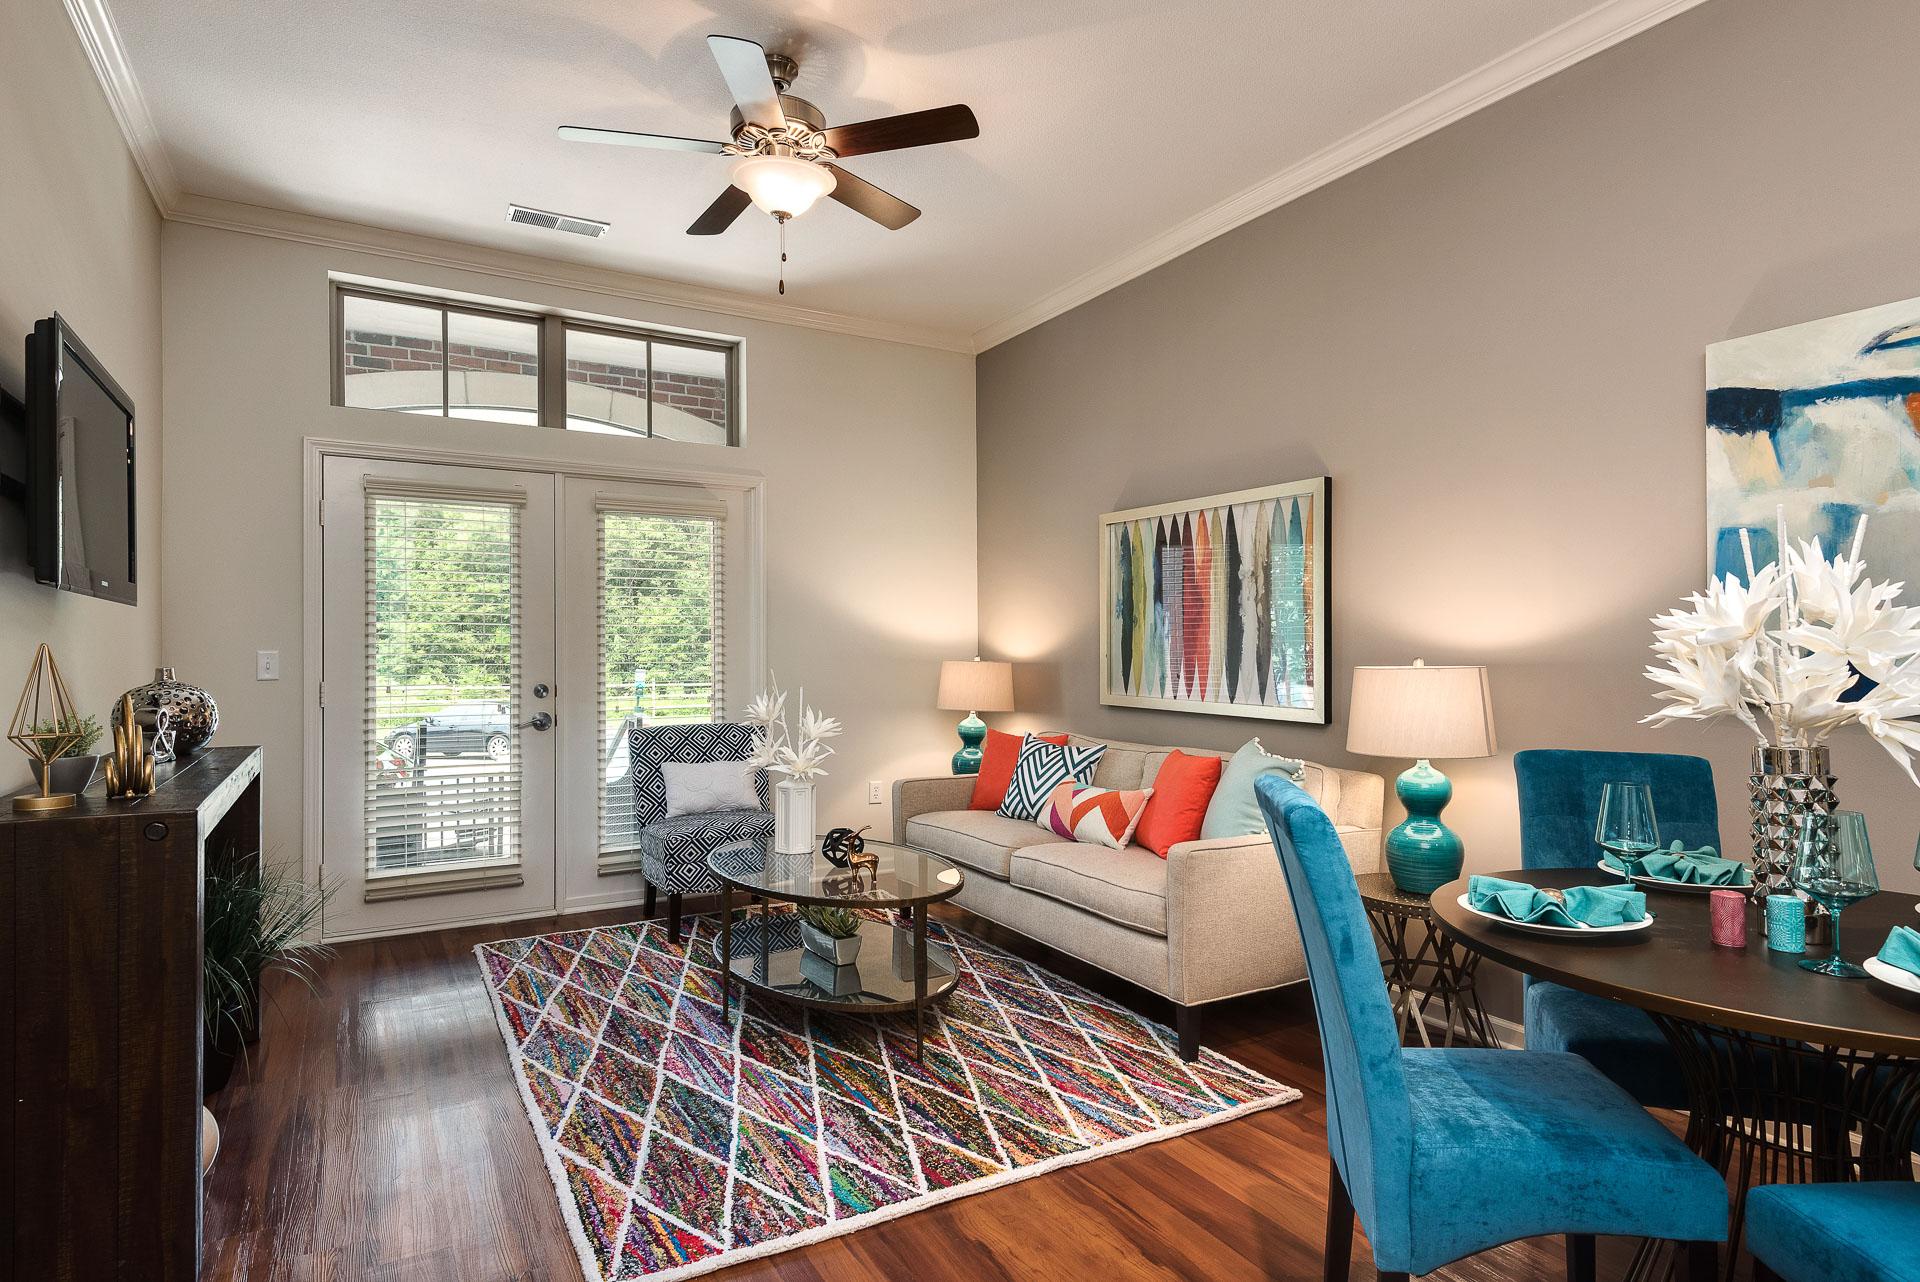 Sherpa Media Kansas City - Apartments & Multi-Family Housing - 26